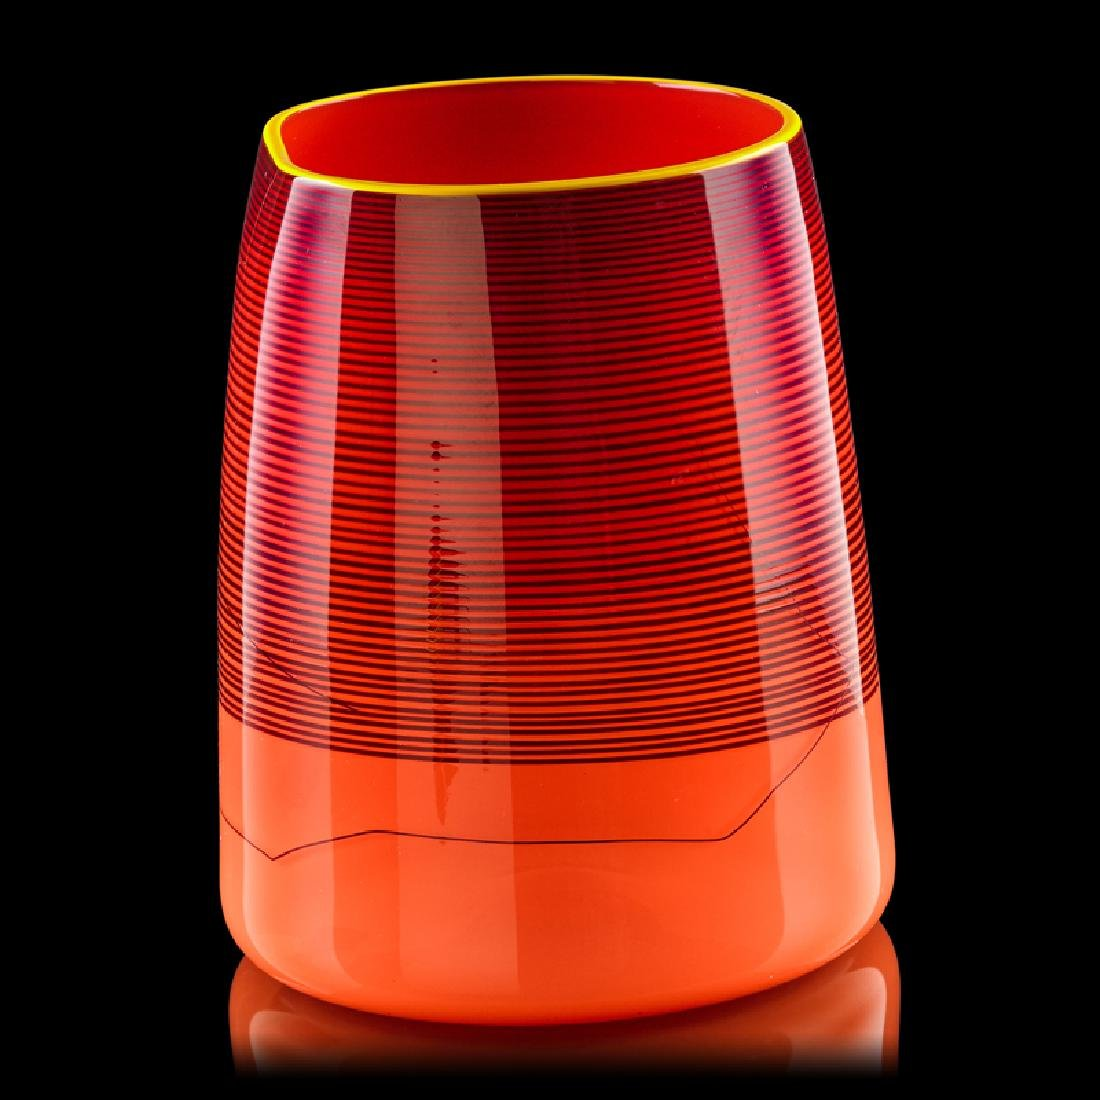 DALE CHIHULY  PORTLAND PRESS Red Blanket Cylinder - 2